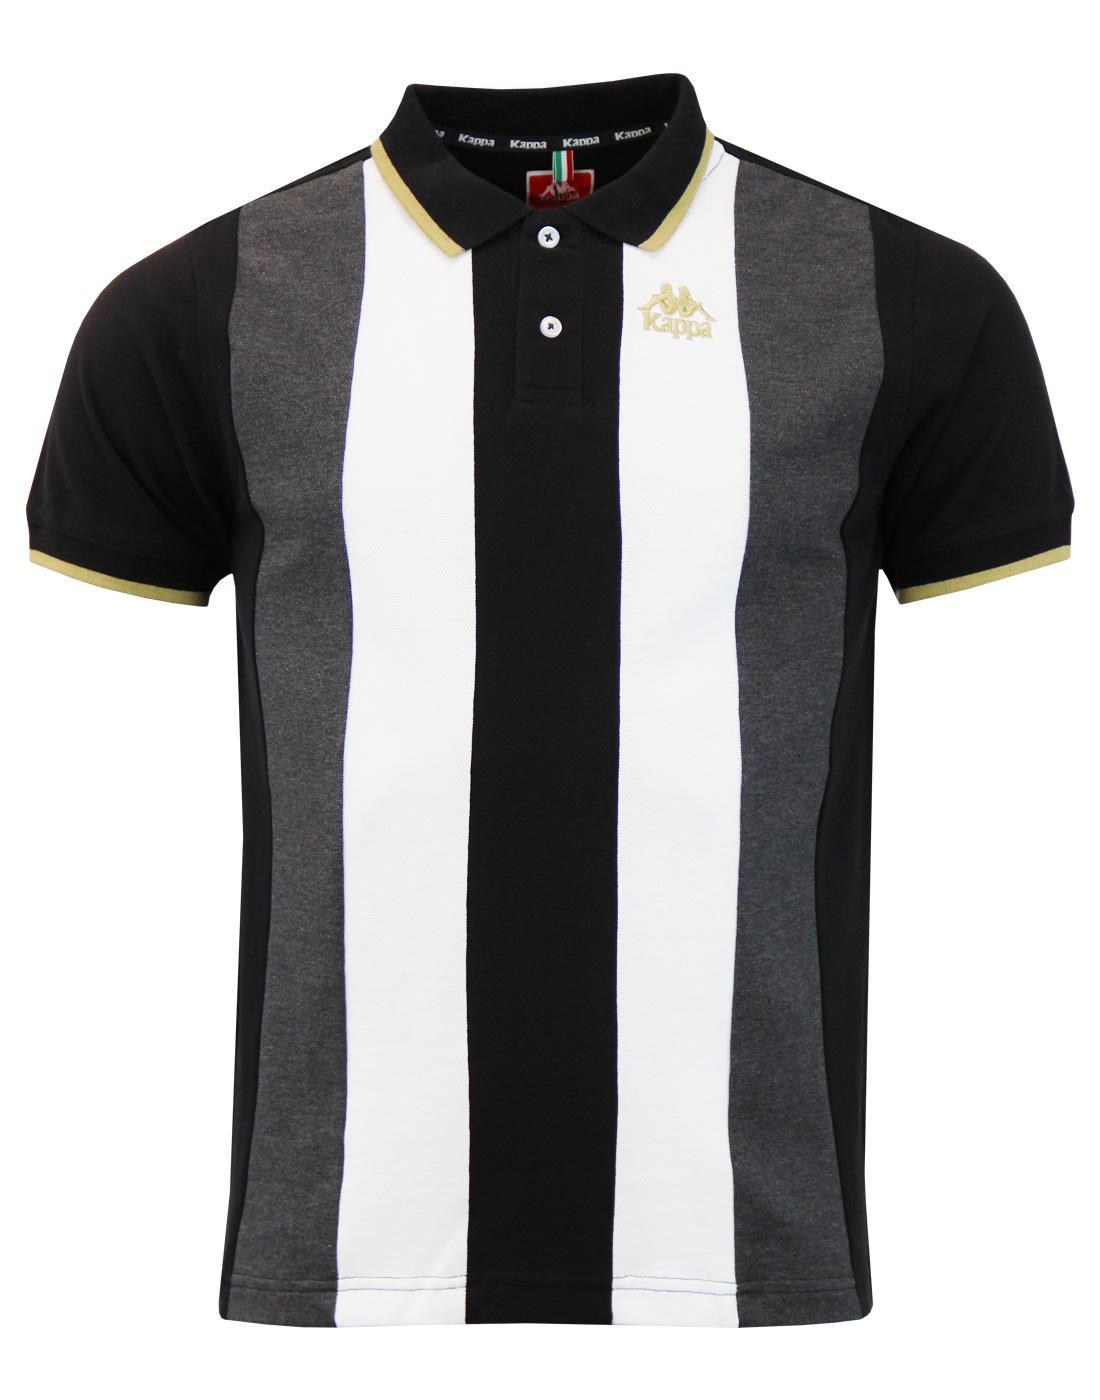 8b8460ab8c KAPPA Keller Men's Retro Indie Mod Stripe Panel Pique Polo Shirt